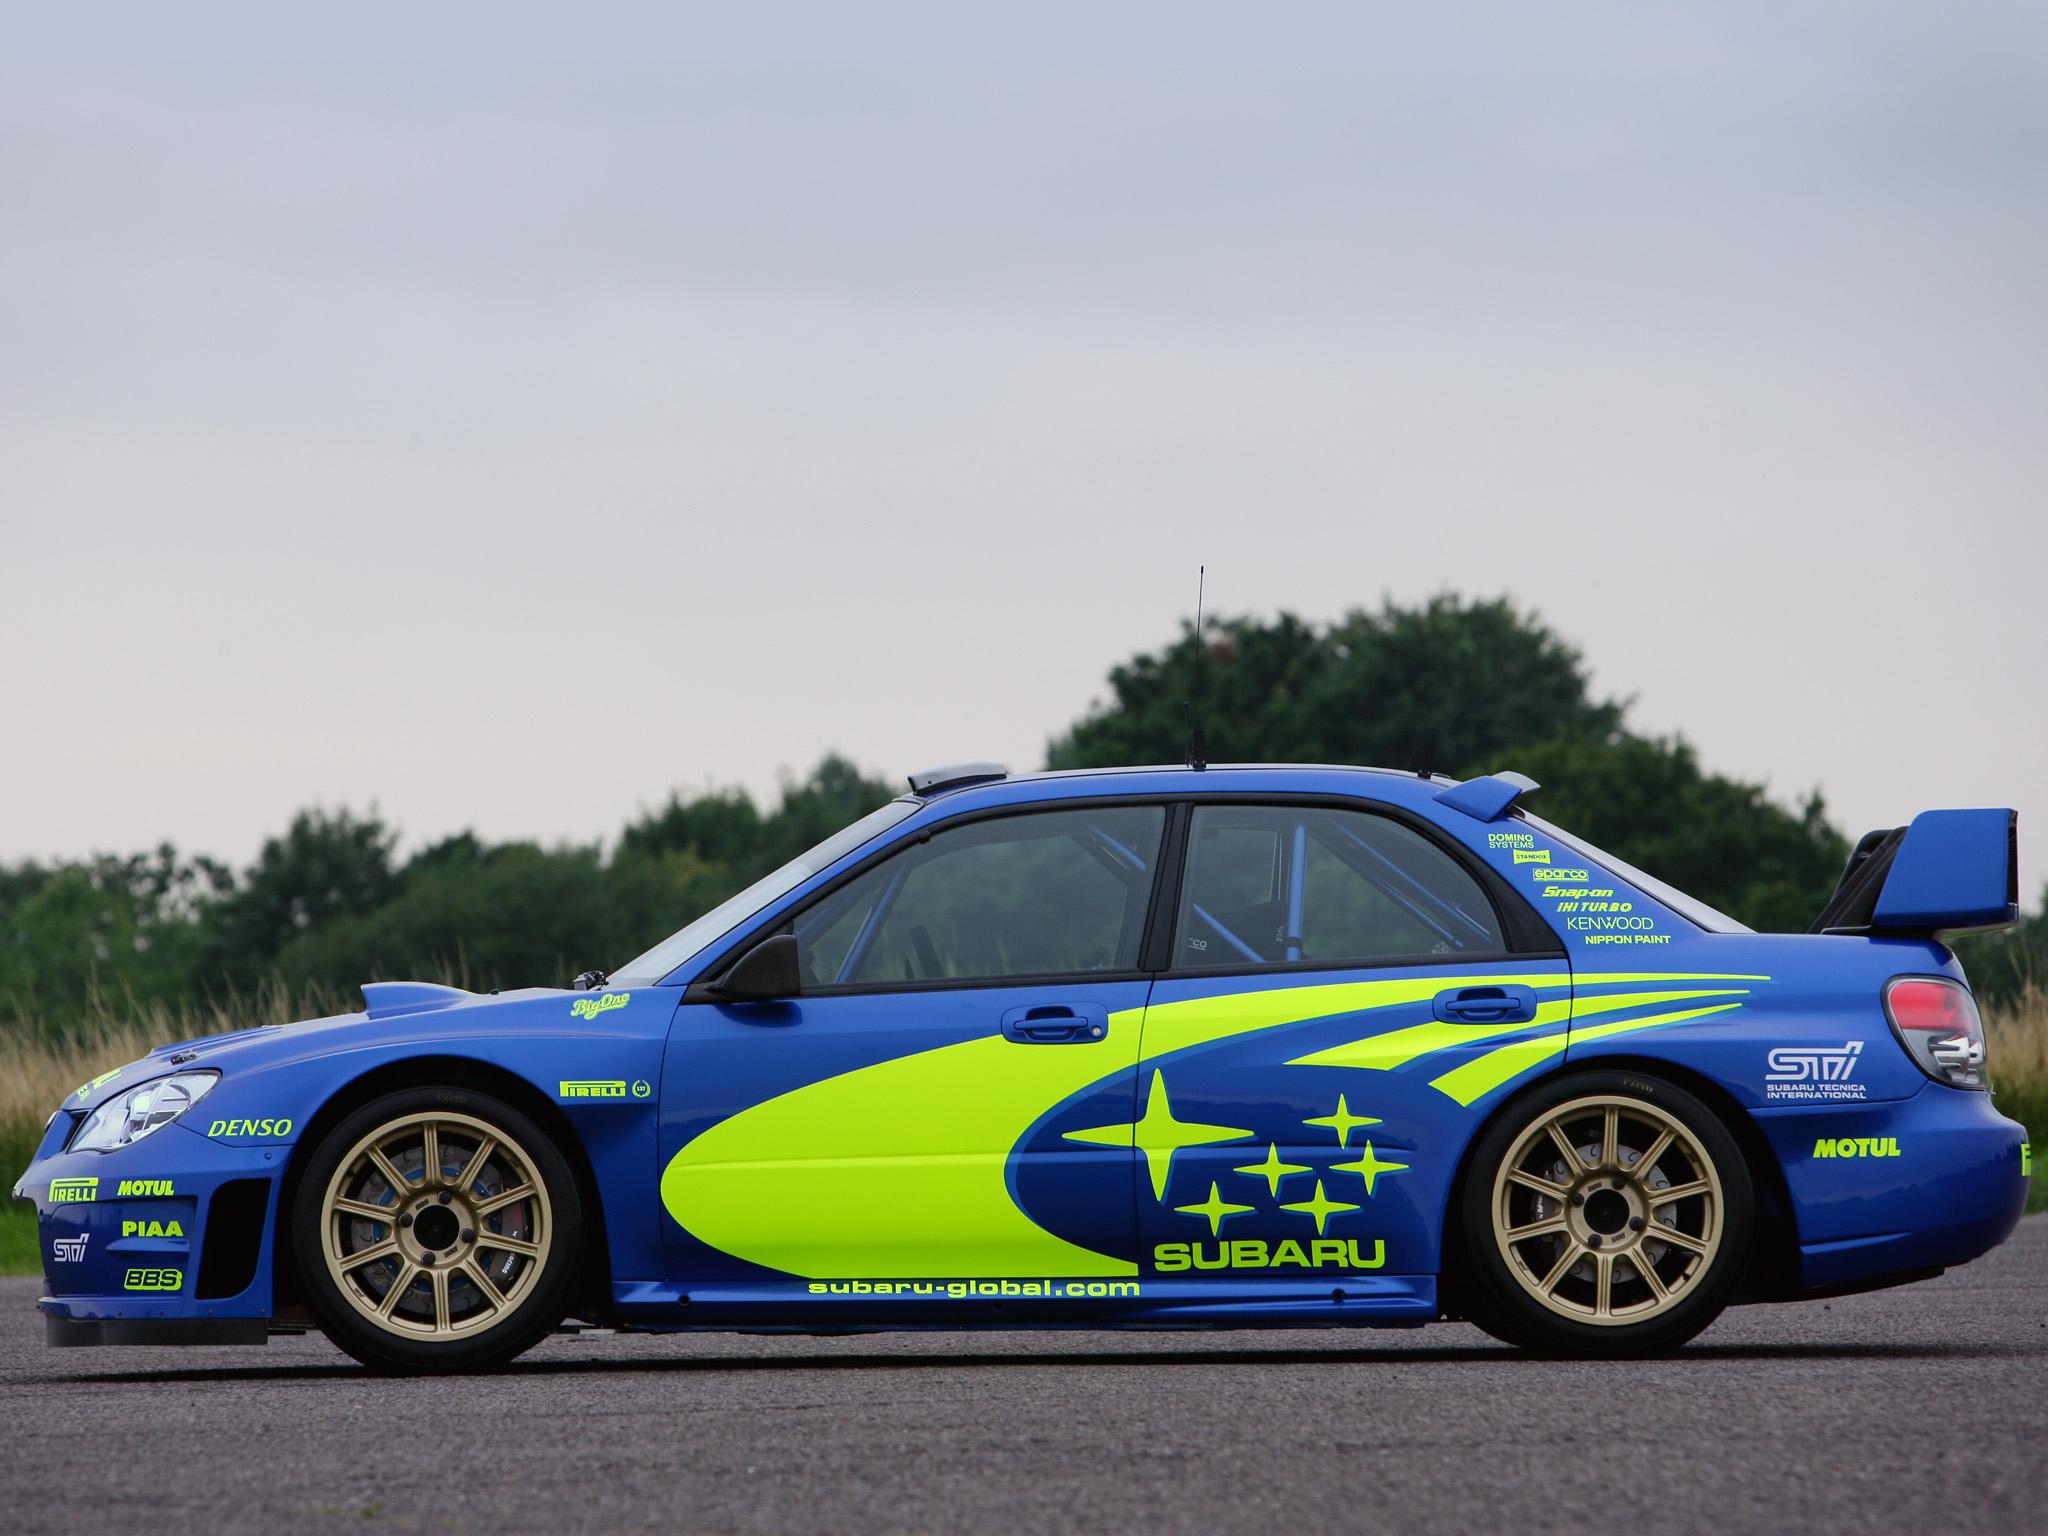 Subaru rally team wallpaper